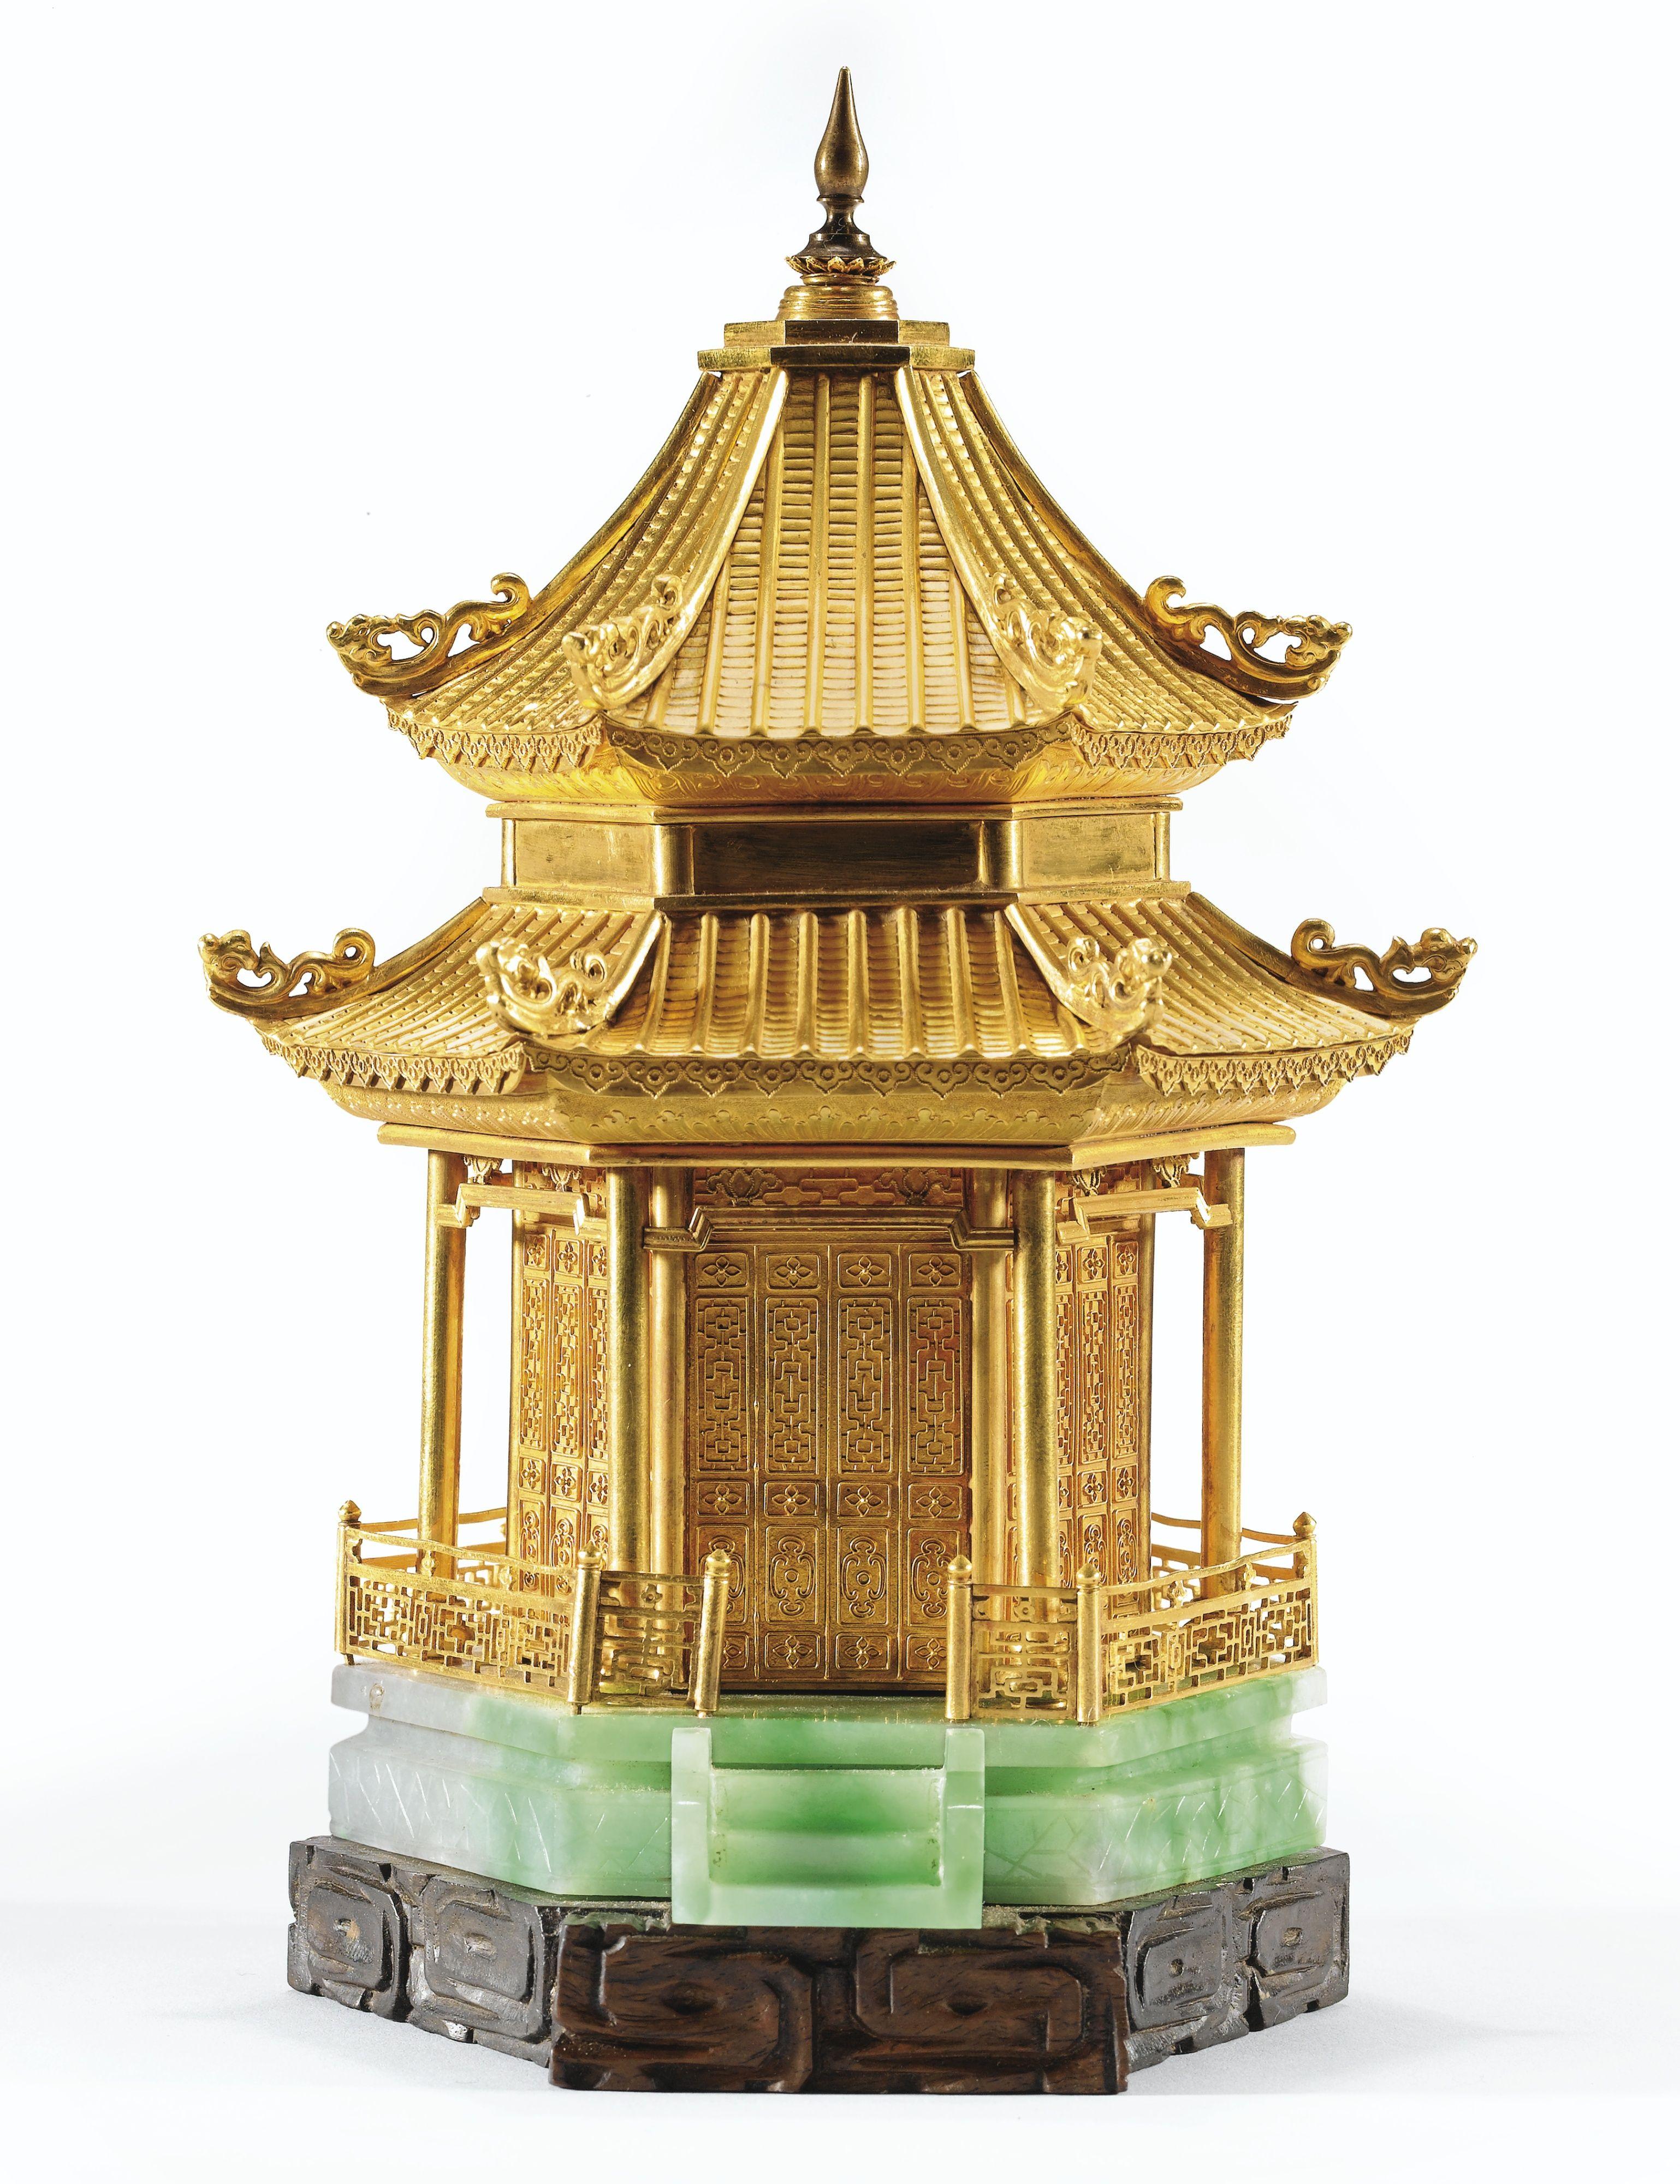 Miniature Golden Pagoda